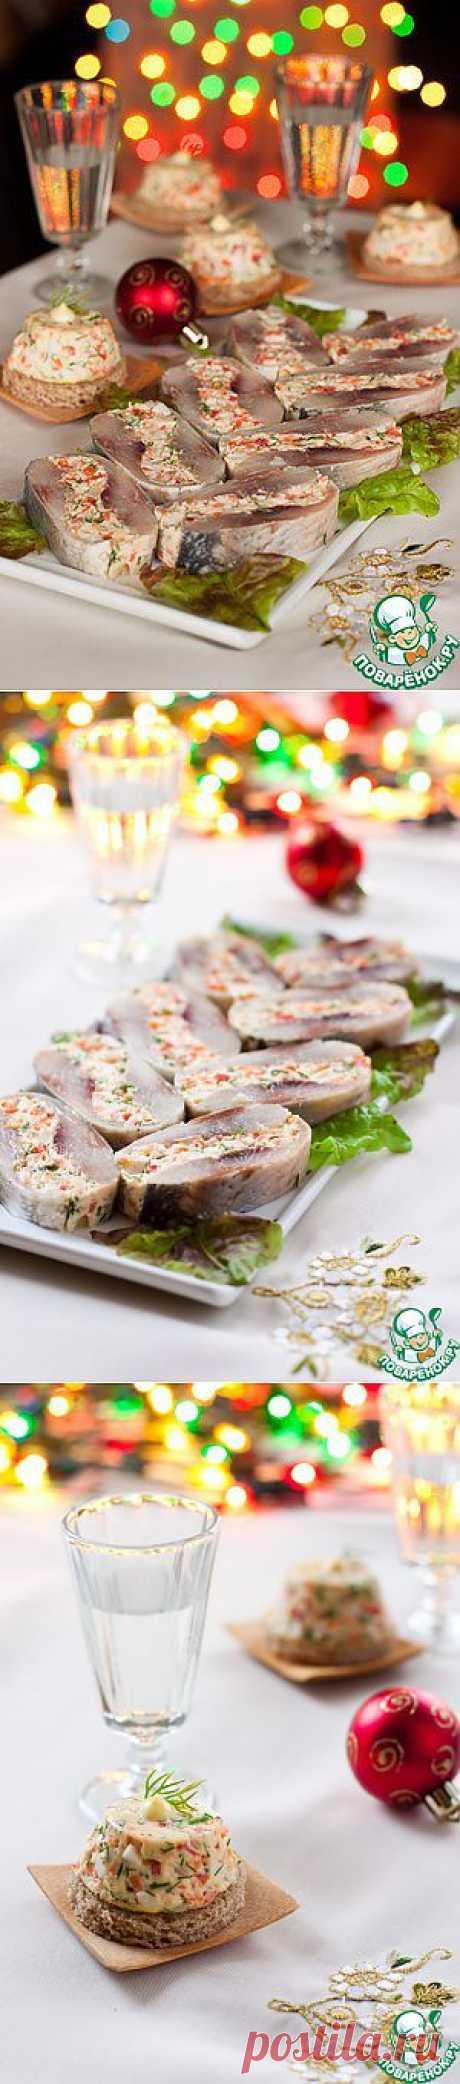 The stuffed herring - the culinary recipe